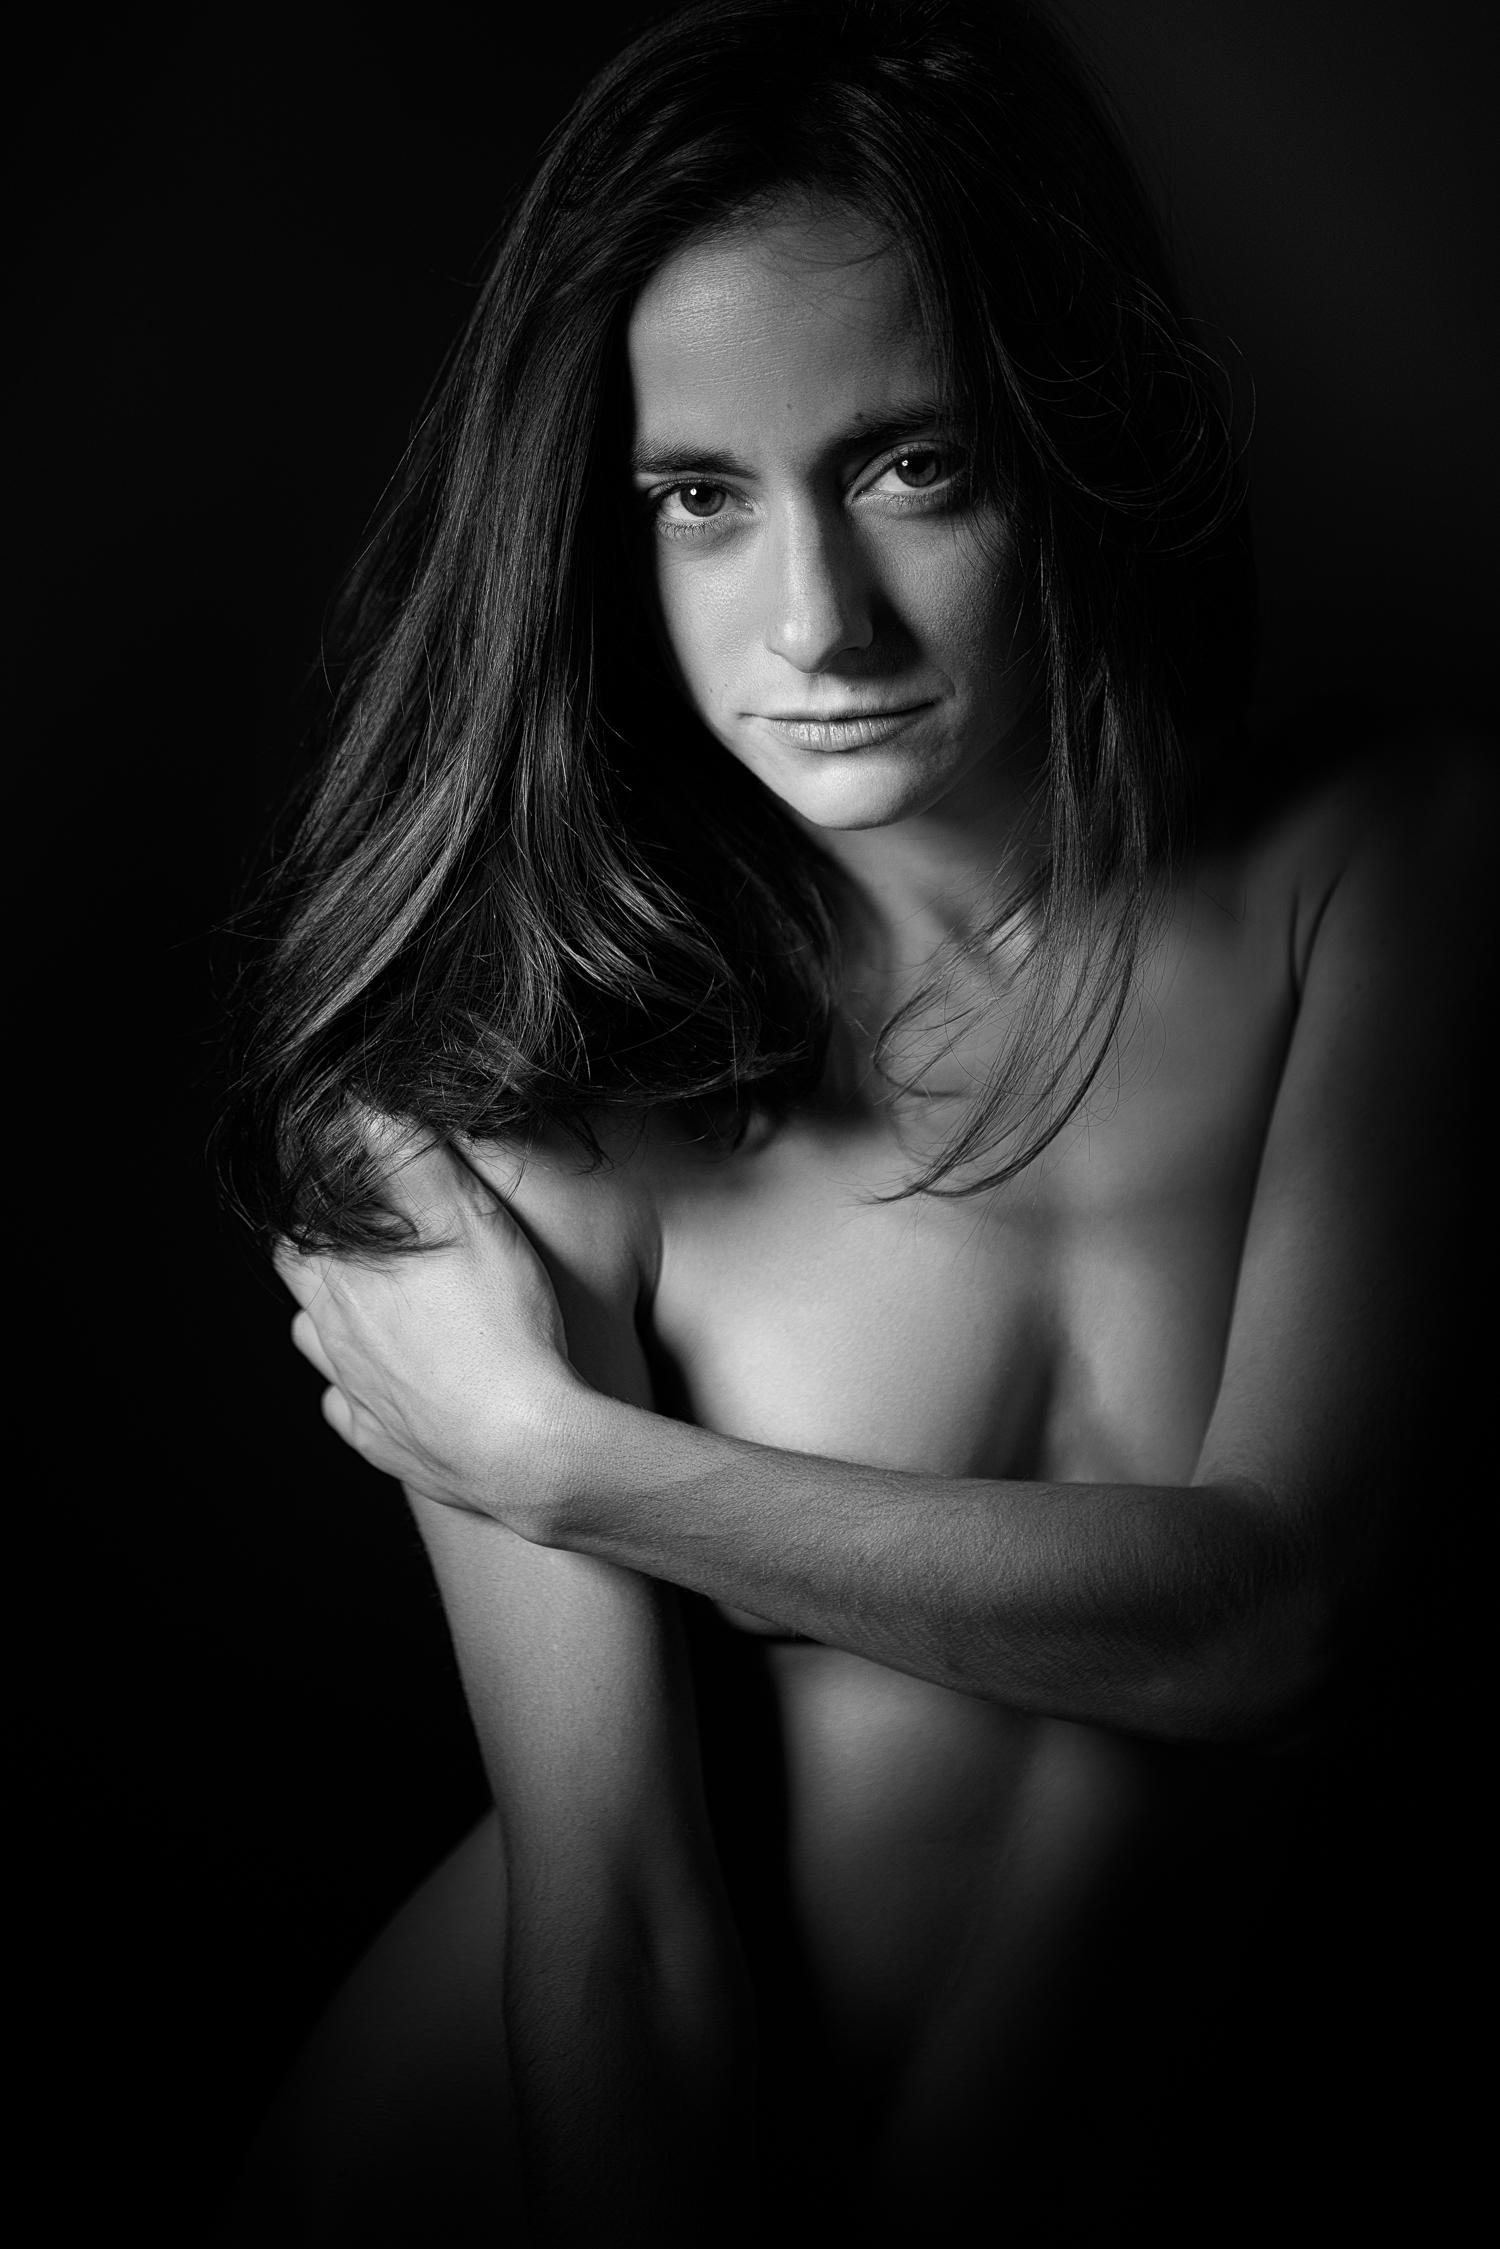 Eva Lmb